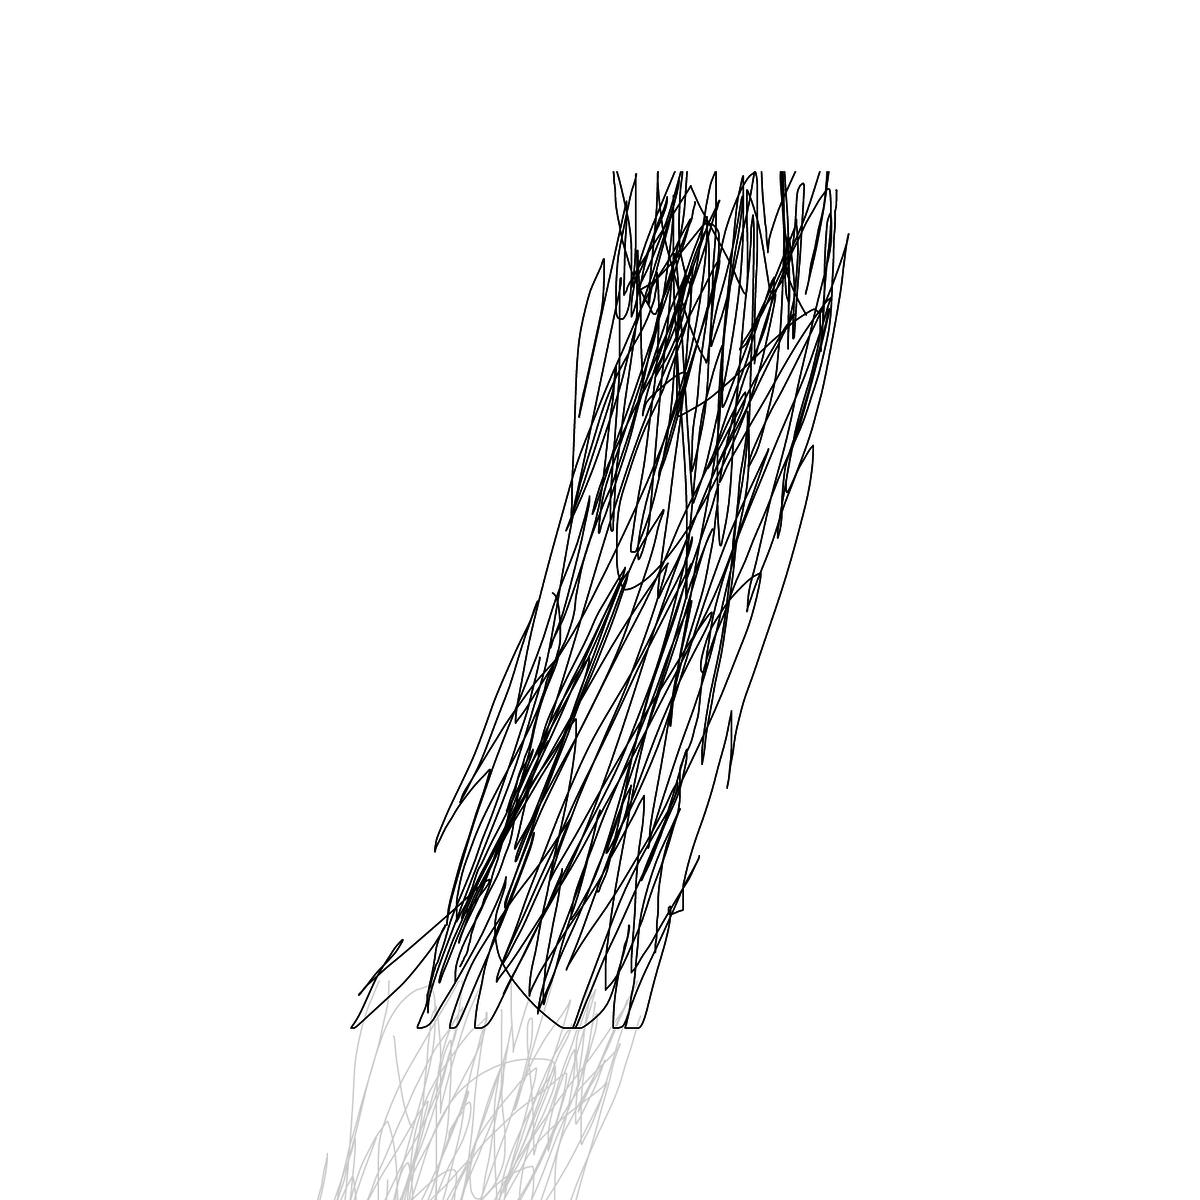 BAAAM drawing#6138 lat:51.3322372436523440lng: 12.3623304367065430